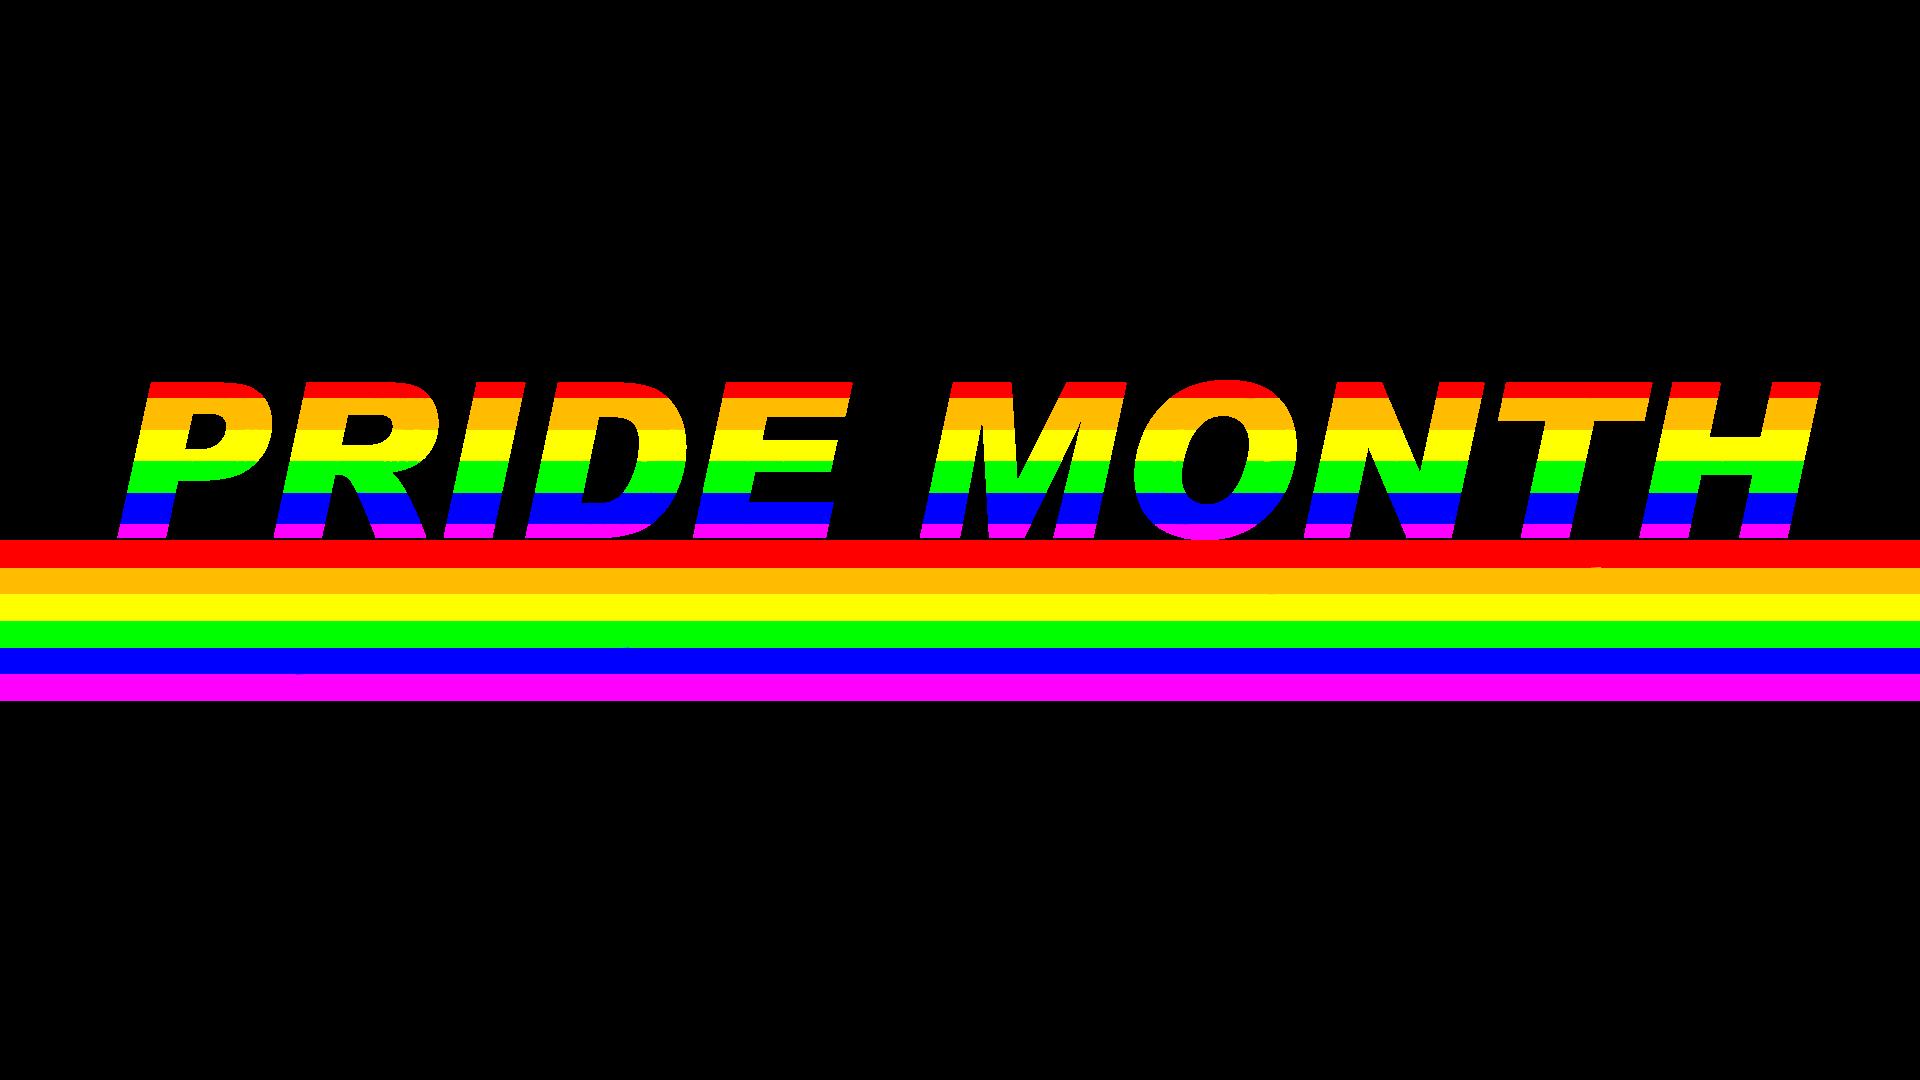 pride month - photo #47